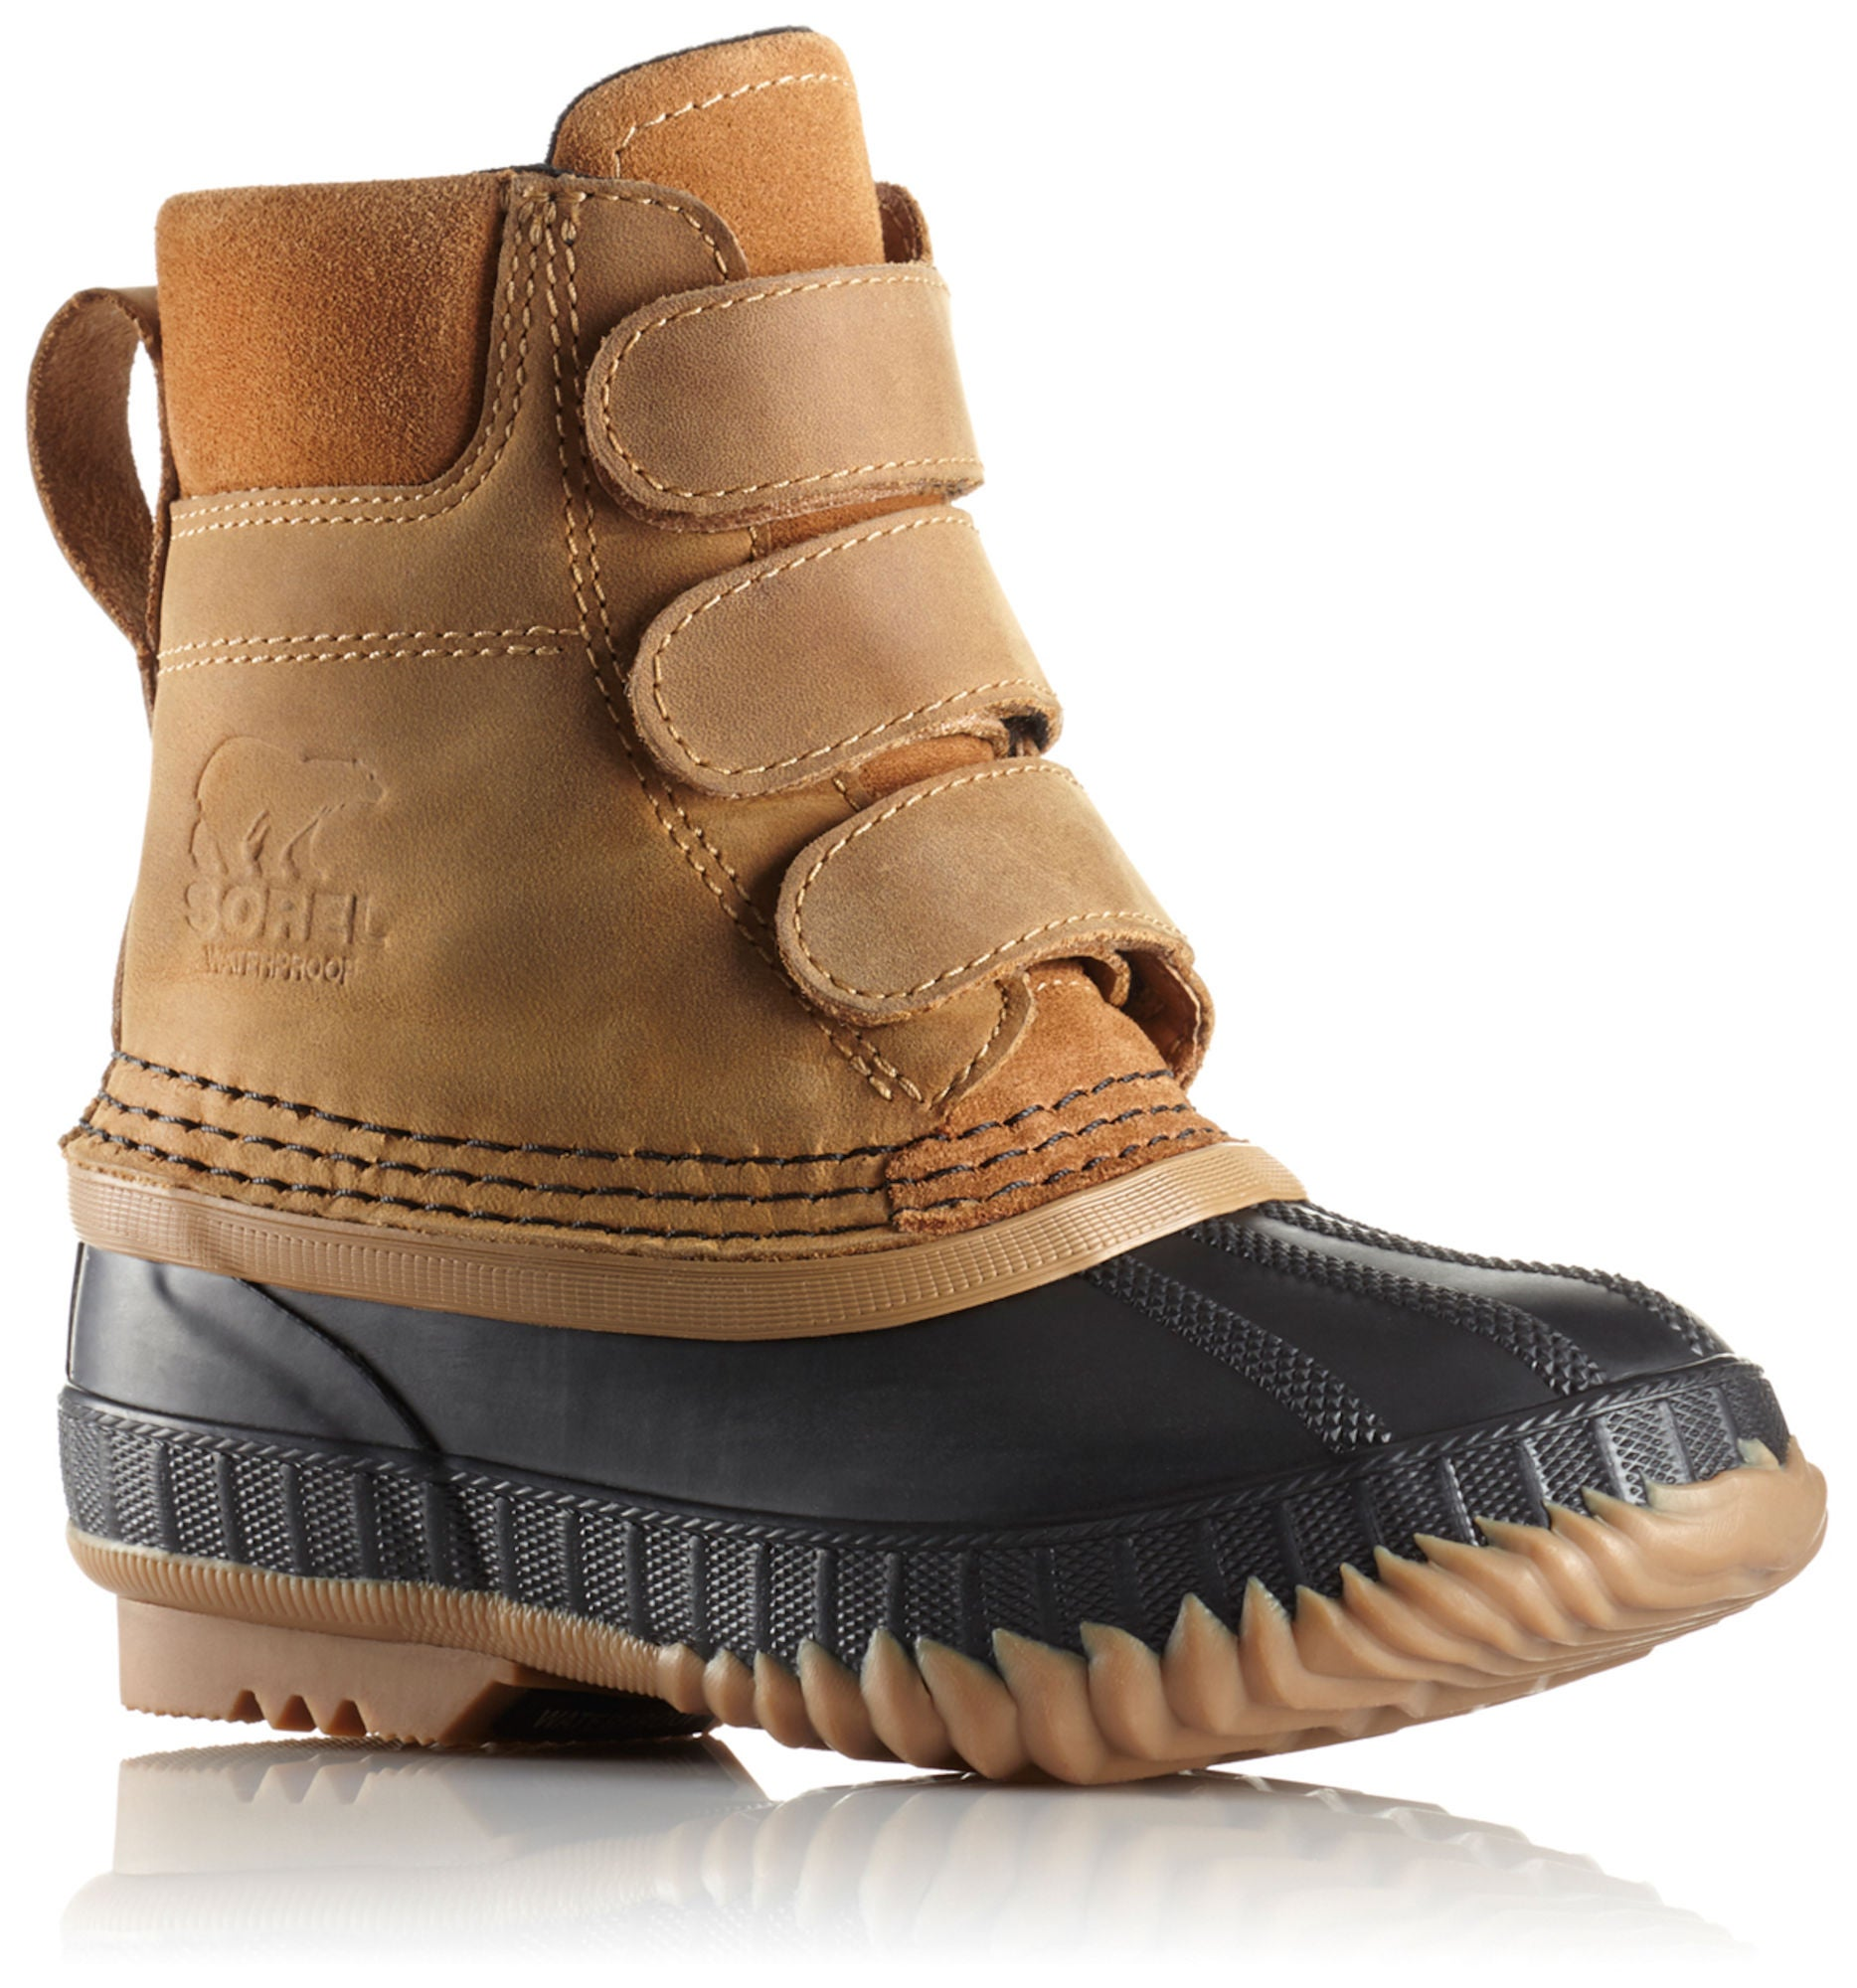 Køb Sorel Children's Cheyanne Velcro Støvler, ElkBlack